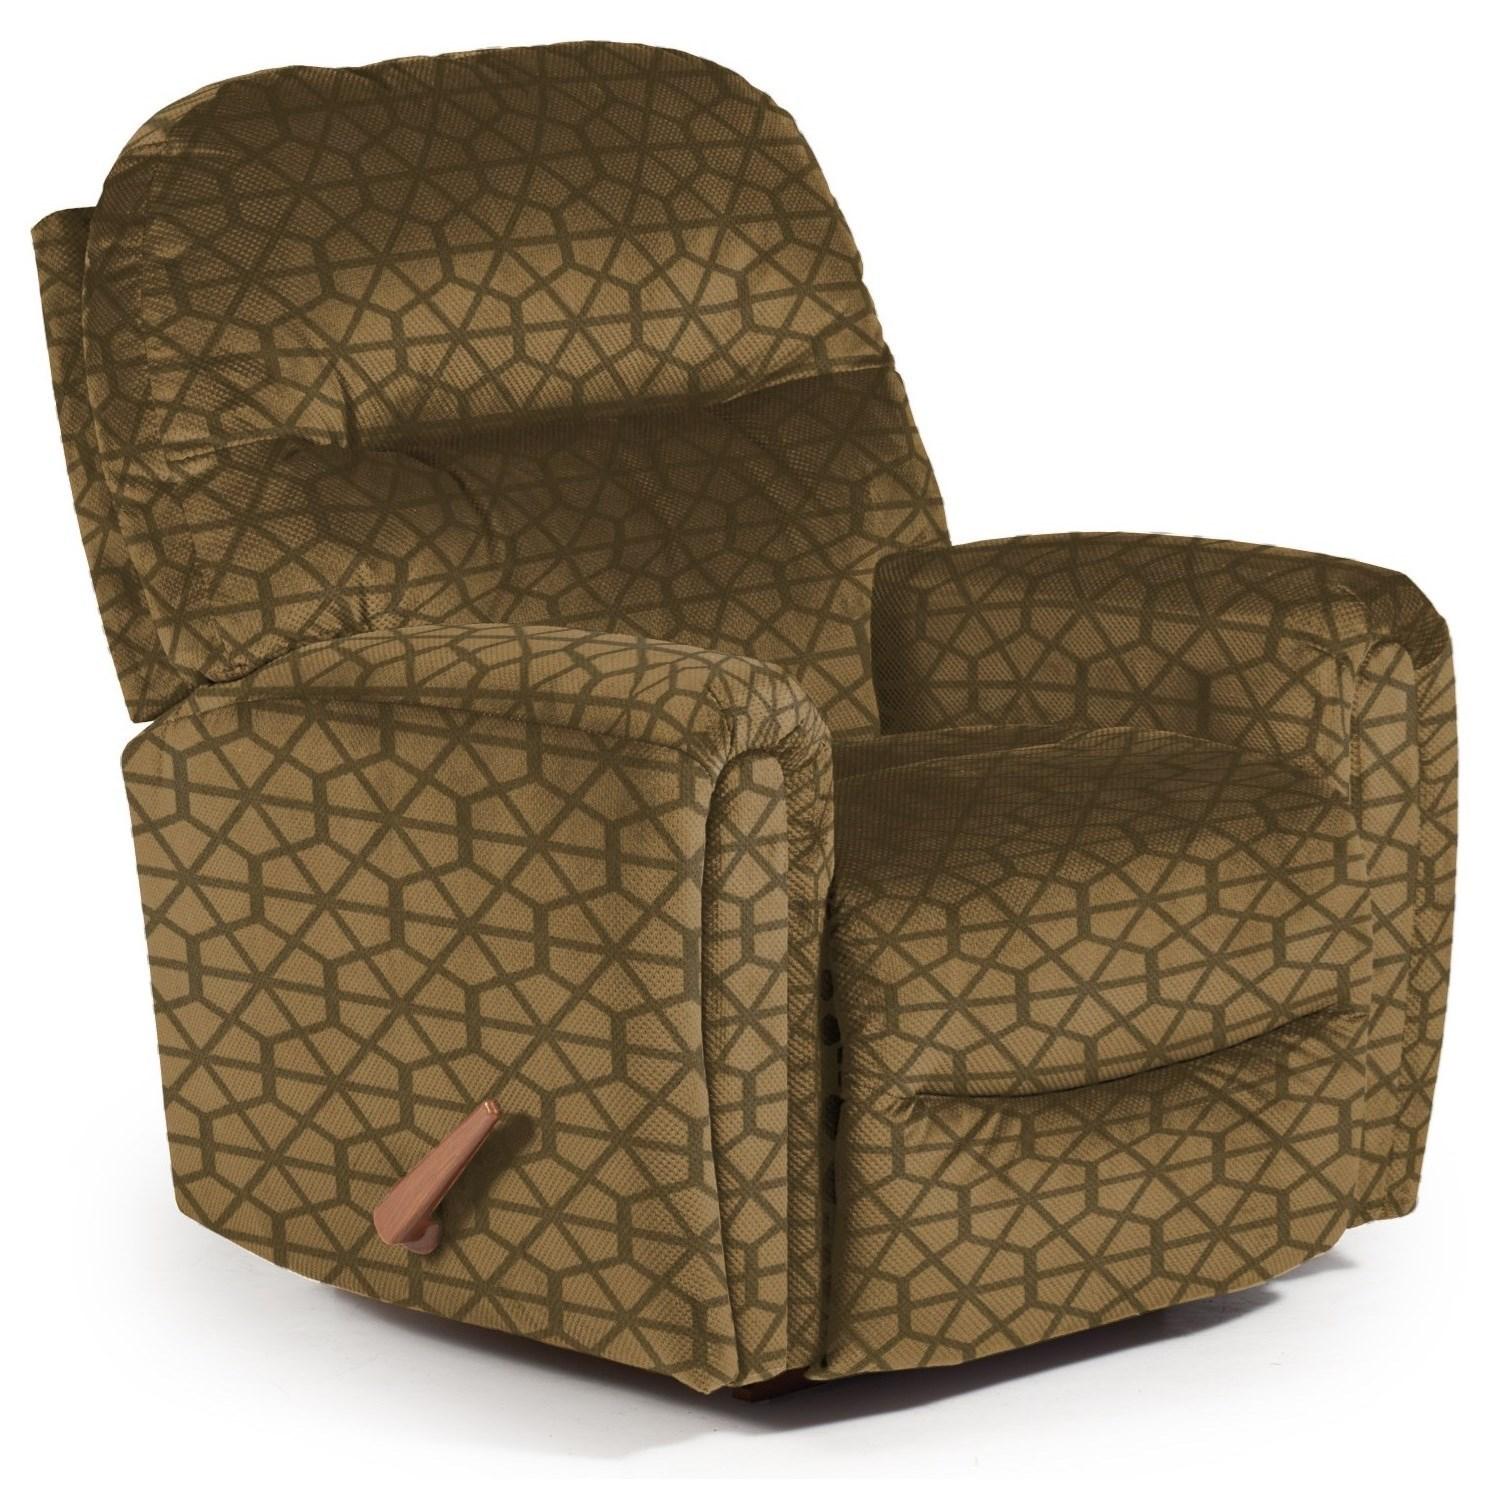 Best Home Furnishings Recliners - Medium Markson Rocker Recliner - Item Number: -962928822-29099